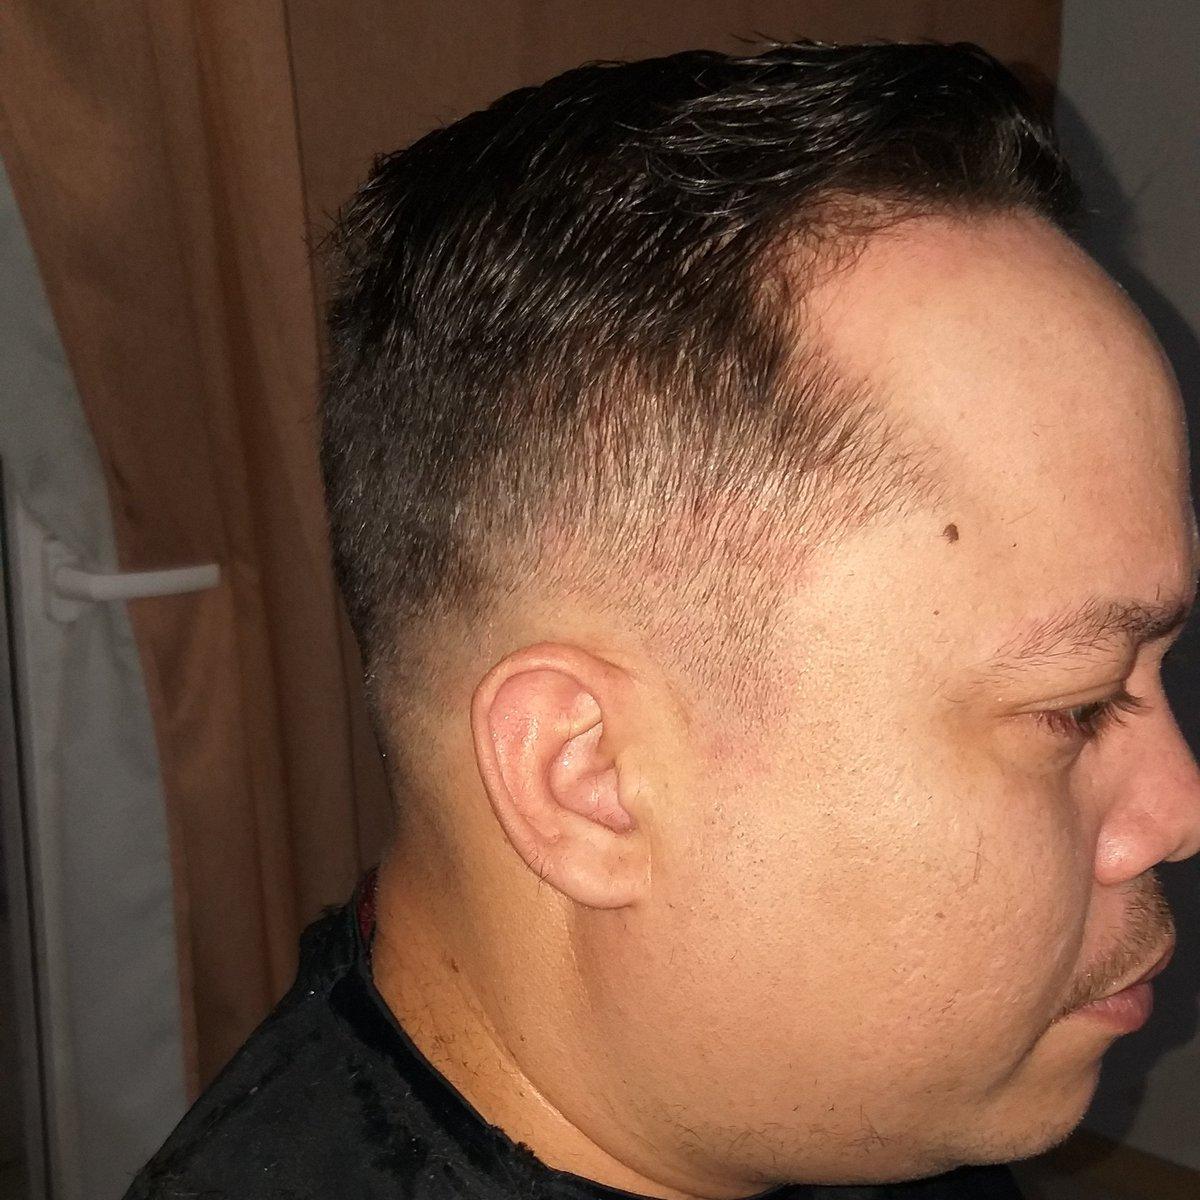 Corte a domicilio  #gustihairstyle #chile #barberia #likeforlikes #cortesAdomicilio #men #degrade #likesforlike #liketime #covid19 #quedateencasa #fashion #chile #peluqueria #barberlife  Gracias gracias graciaspic.twitter.com/83OAIHOuoO